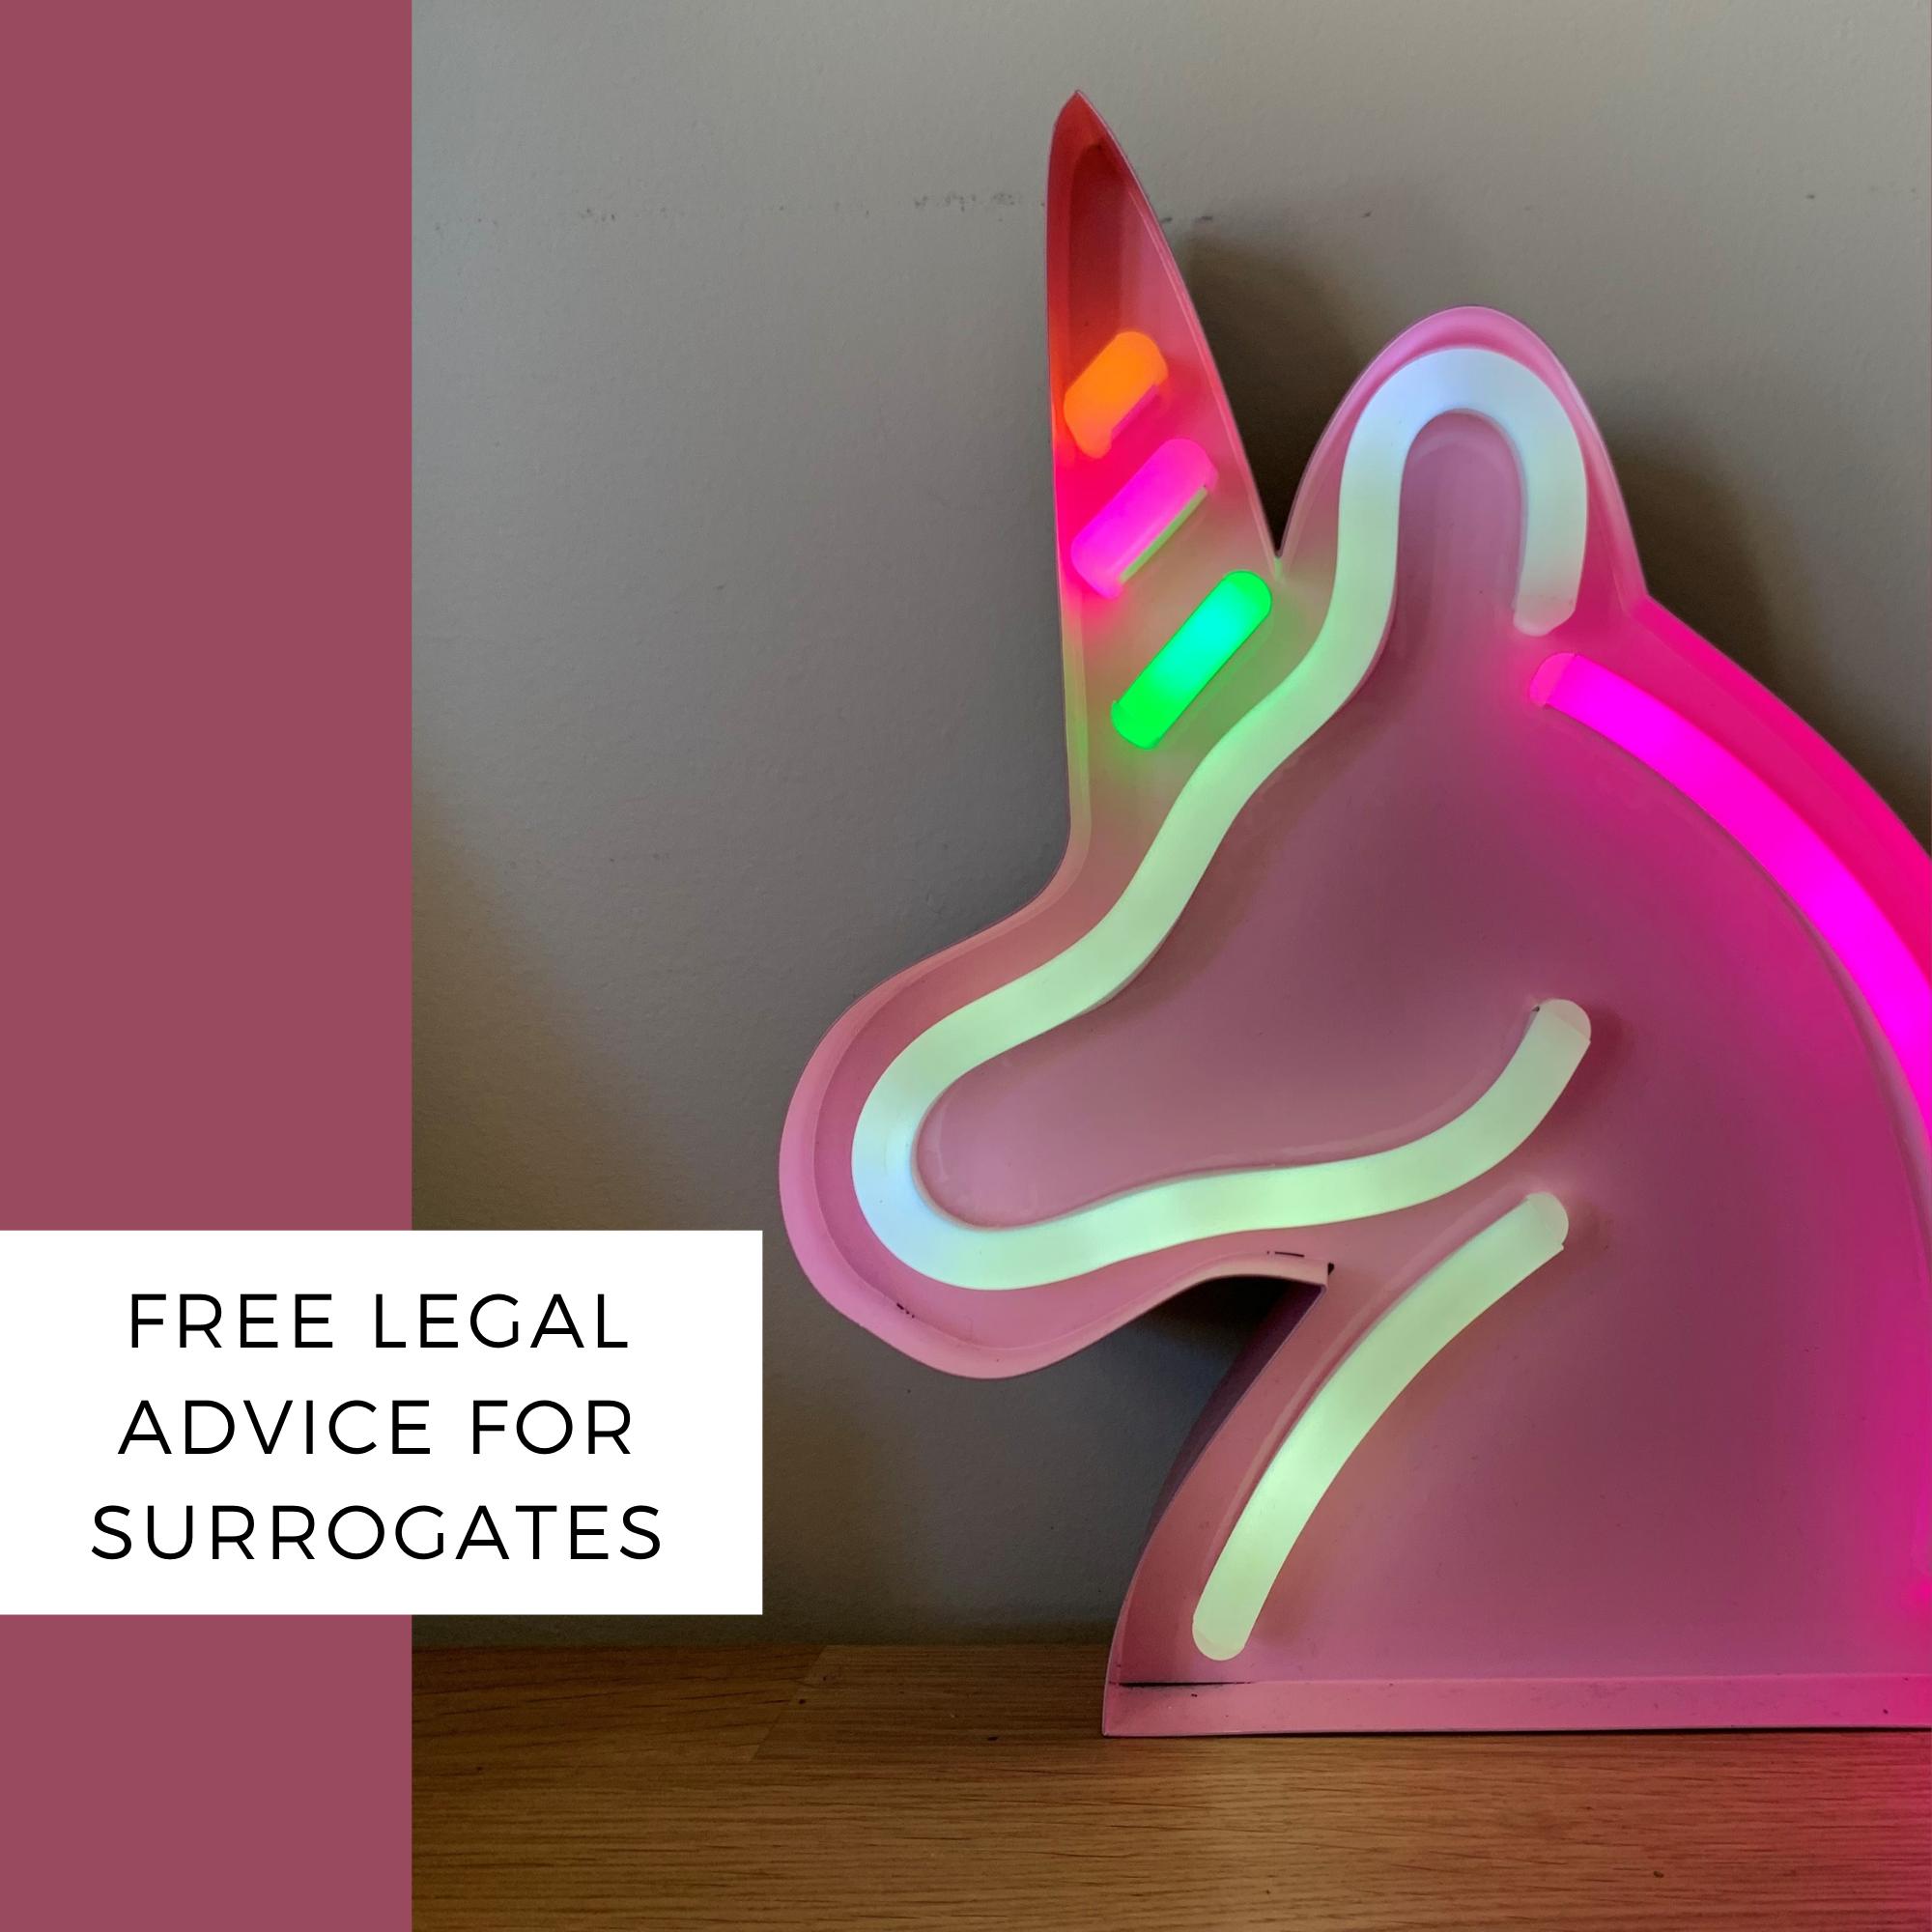 free legal advice for surrogates